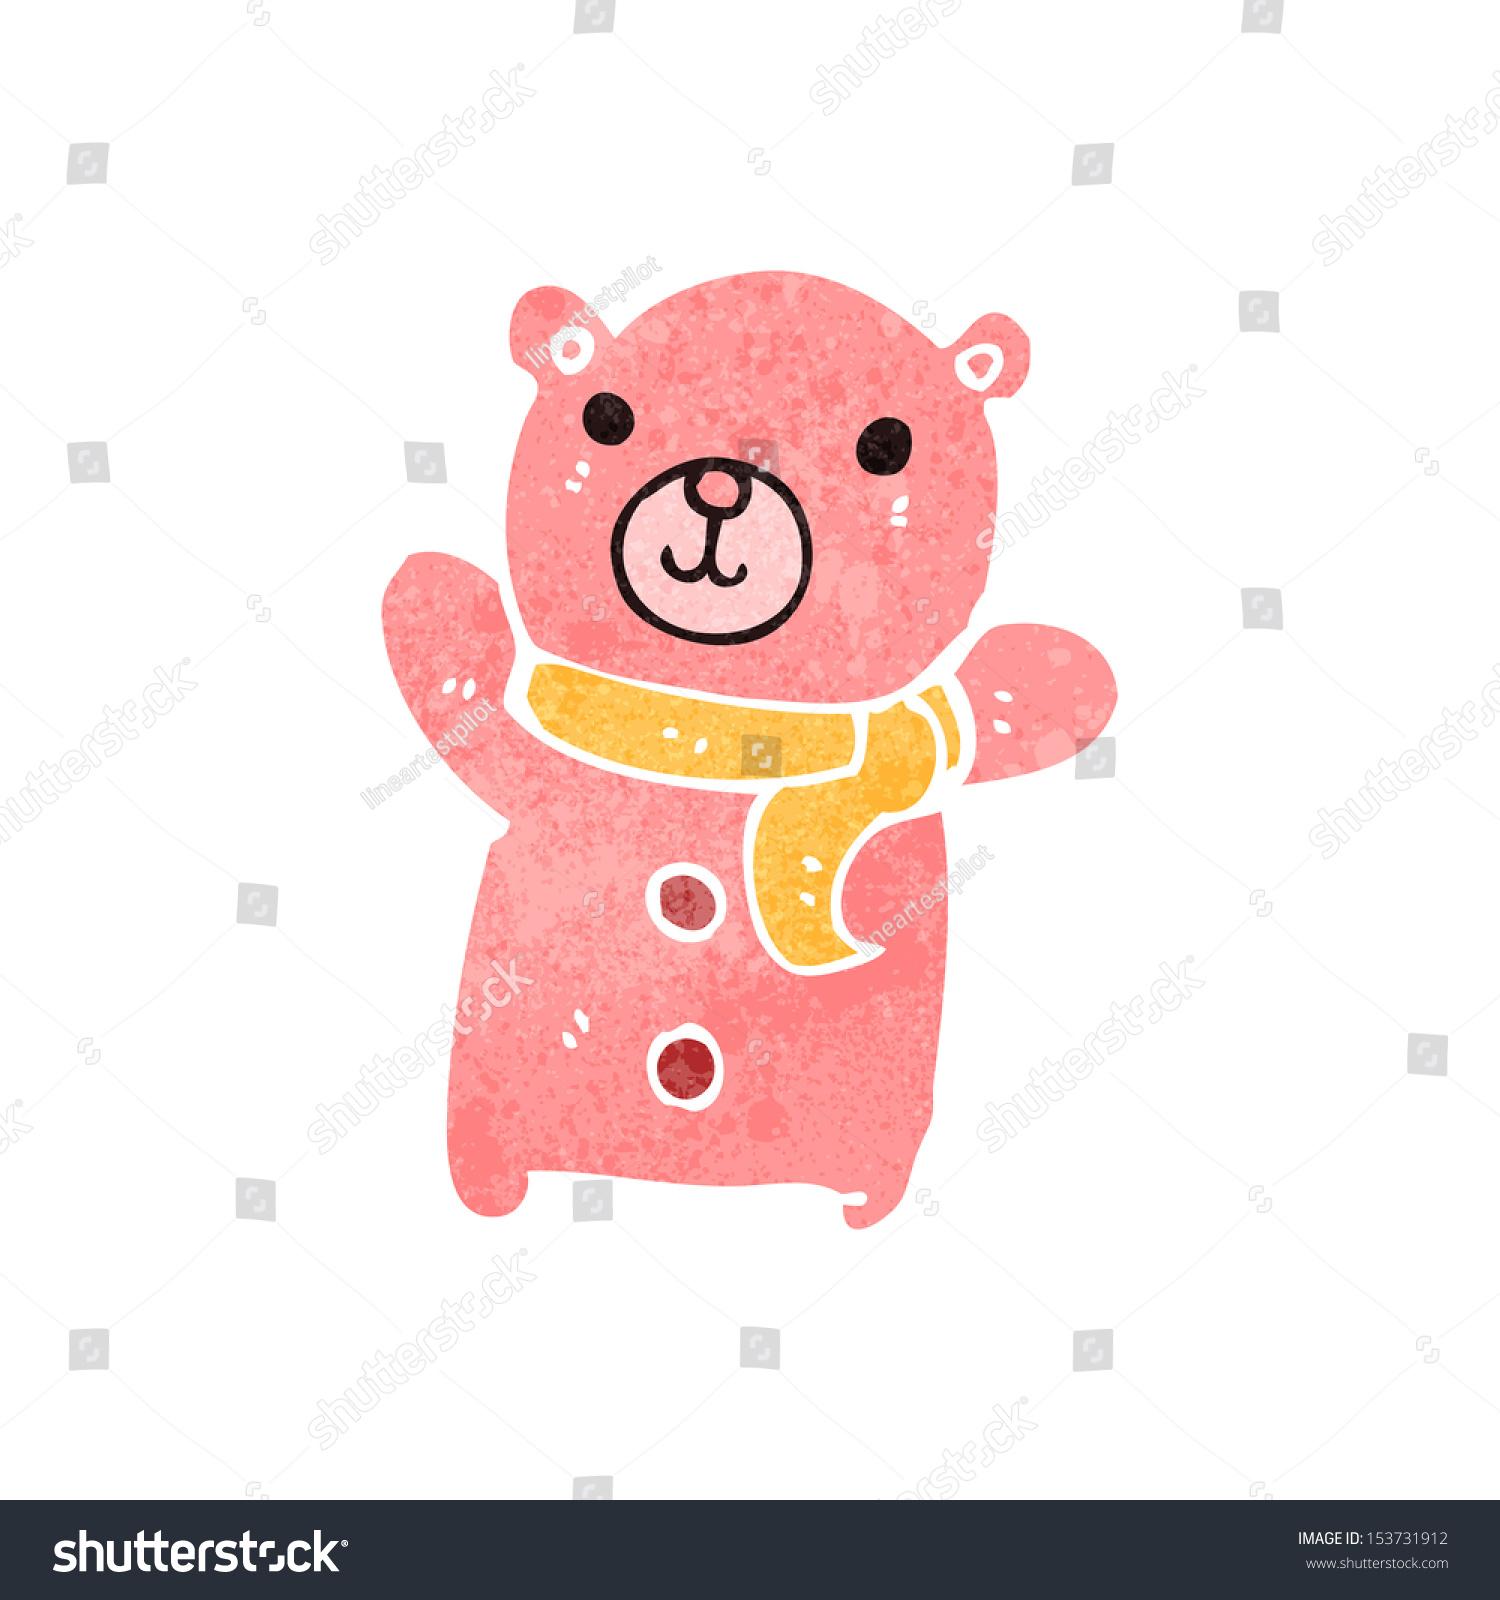 Discount Teddy Bear Cartoon Pink  dhgatecom